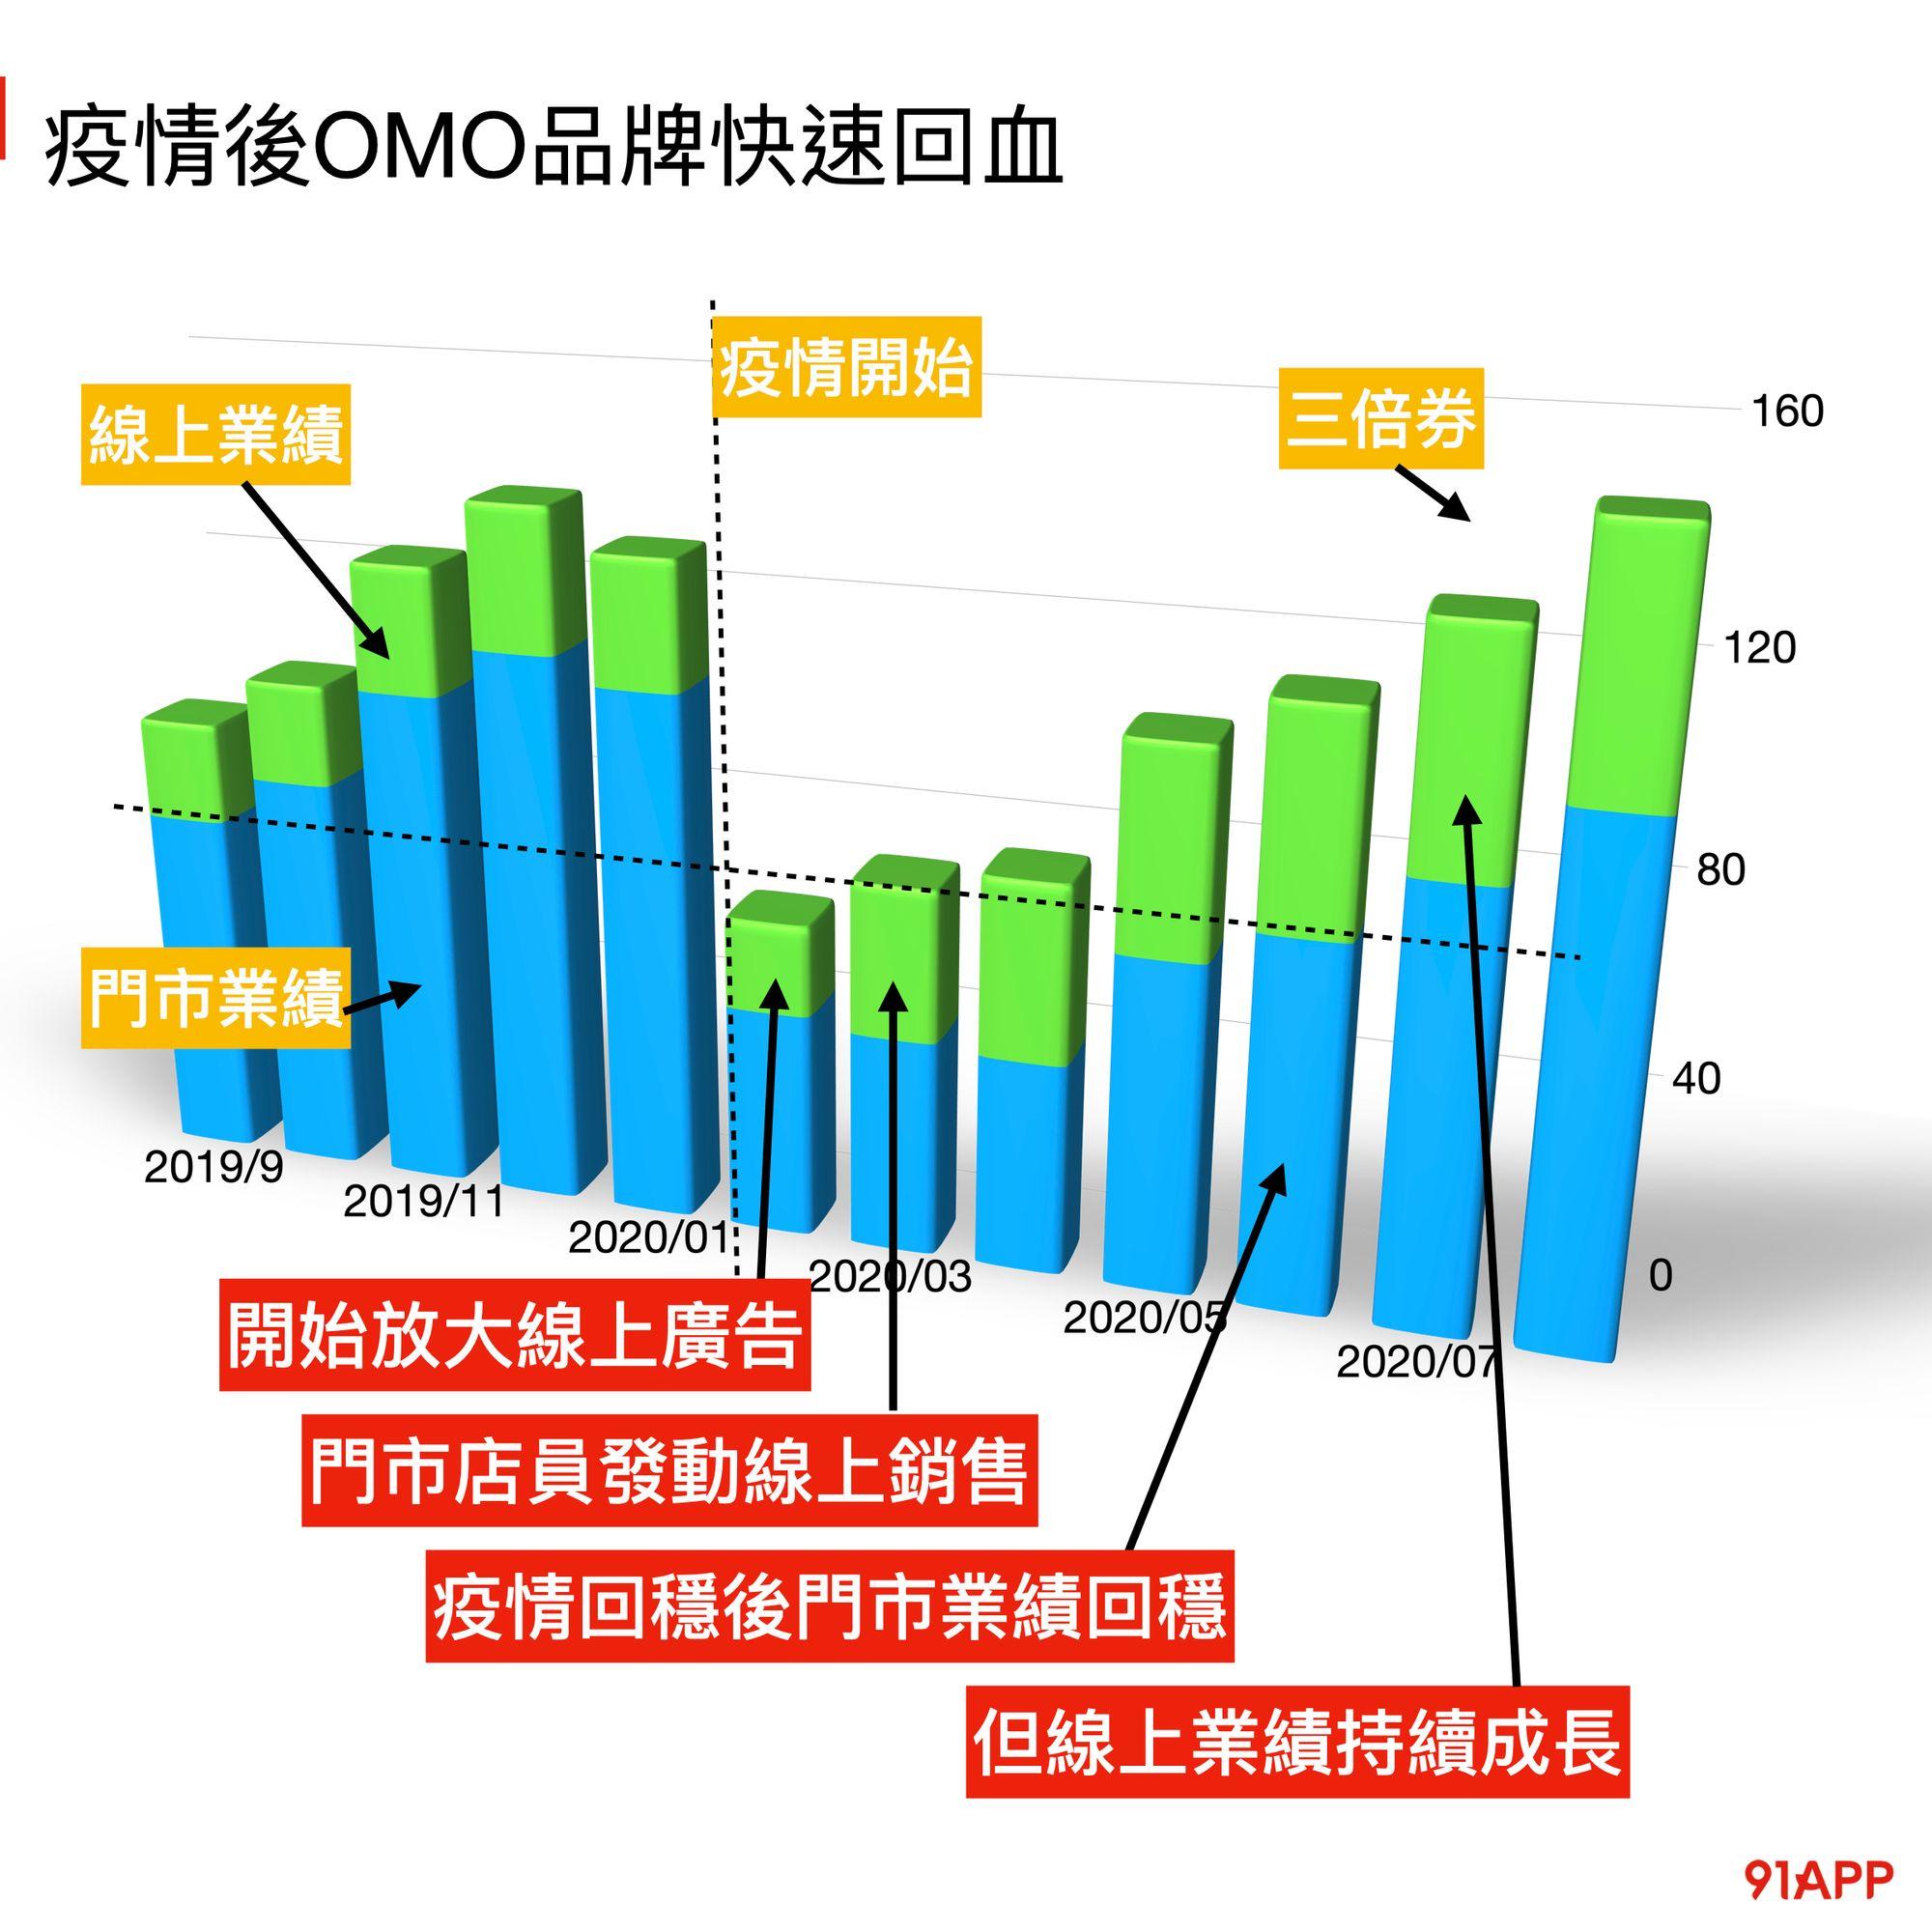 covid-19 肺炎疫情對OMO零售品牌的業績影響